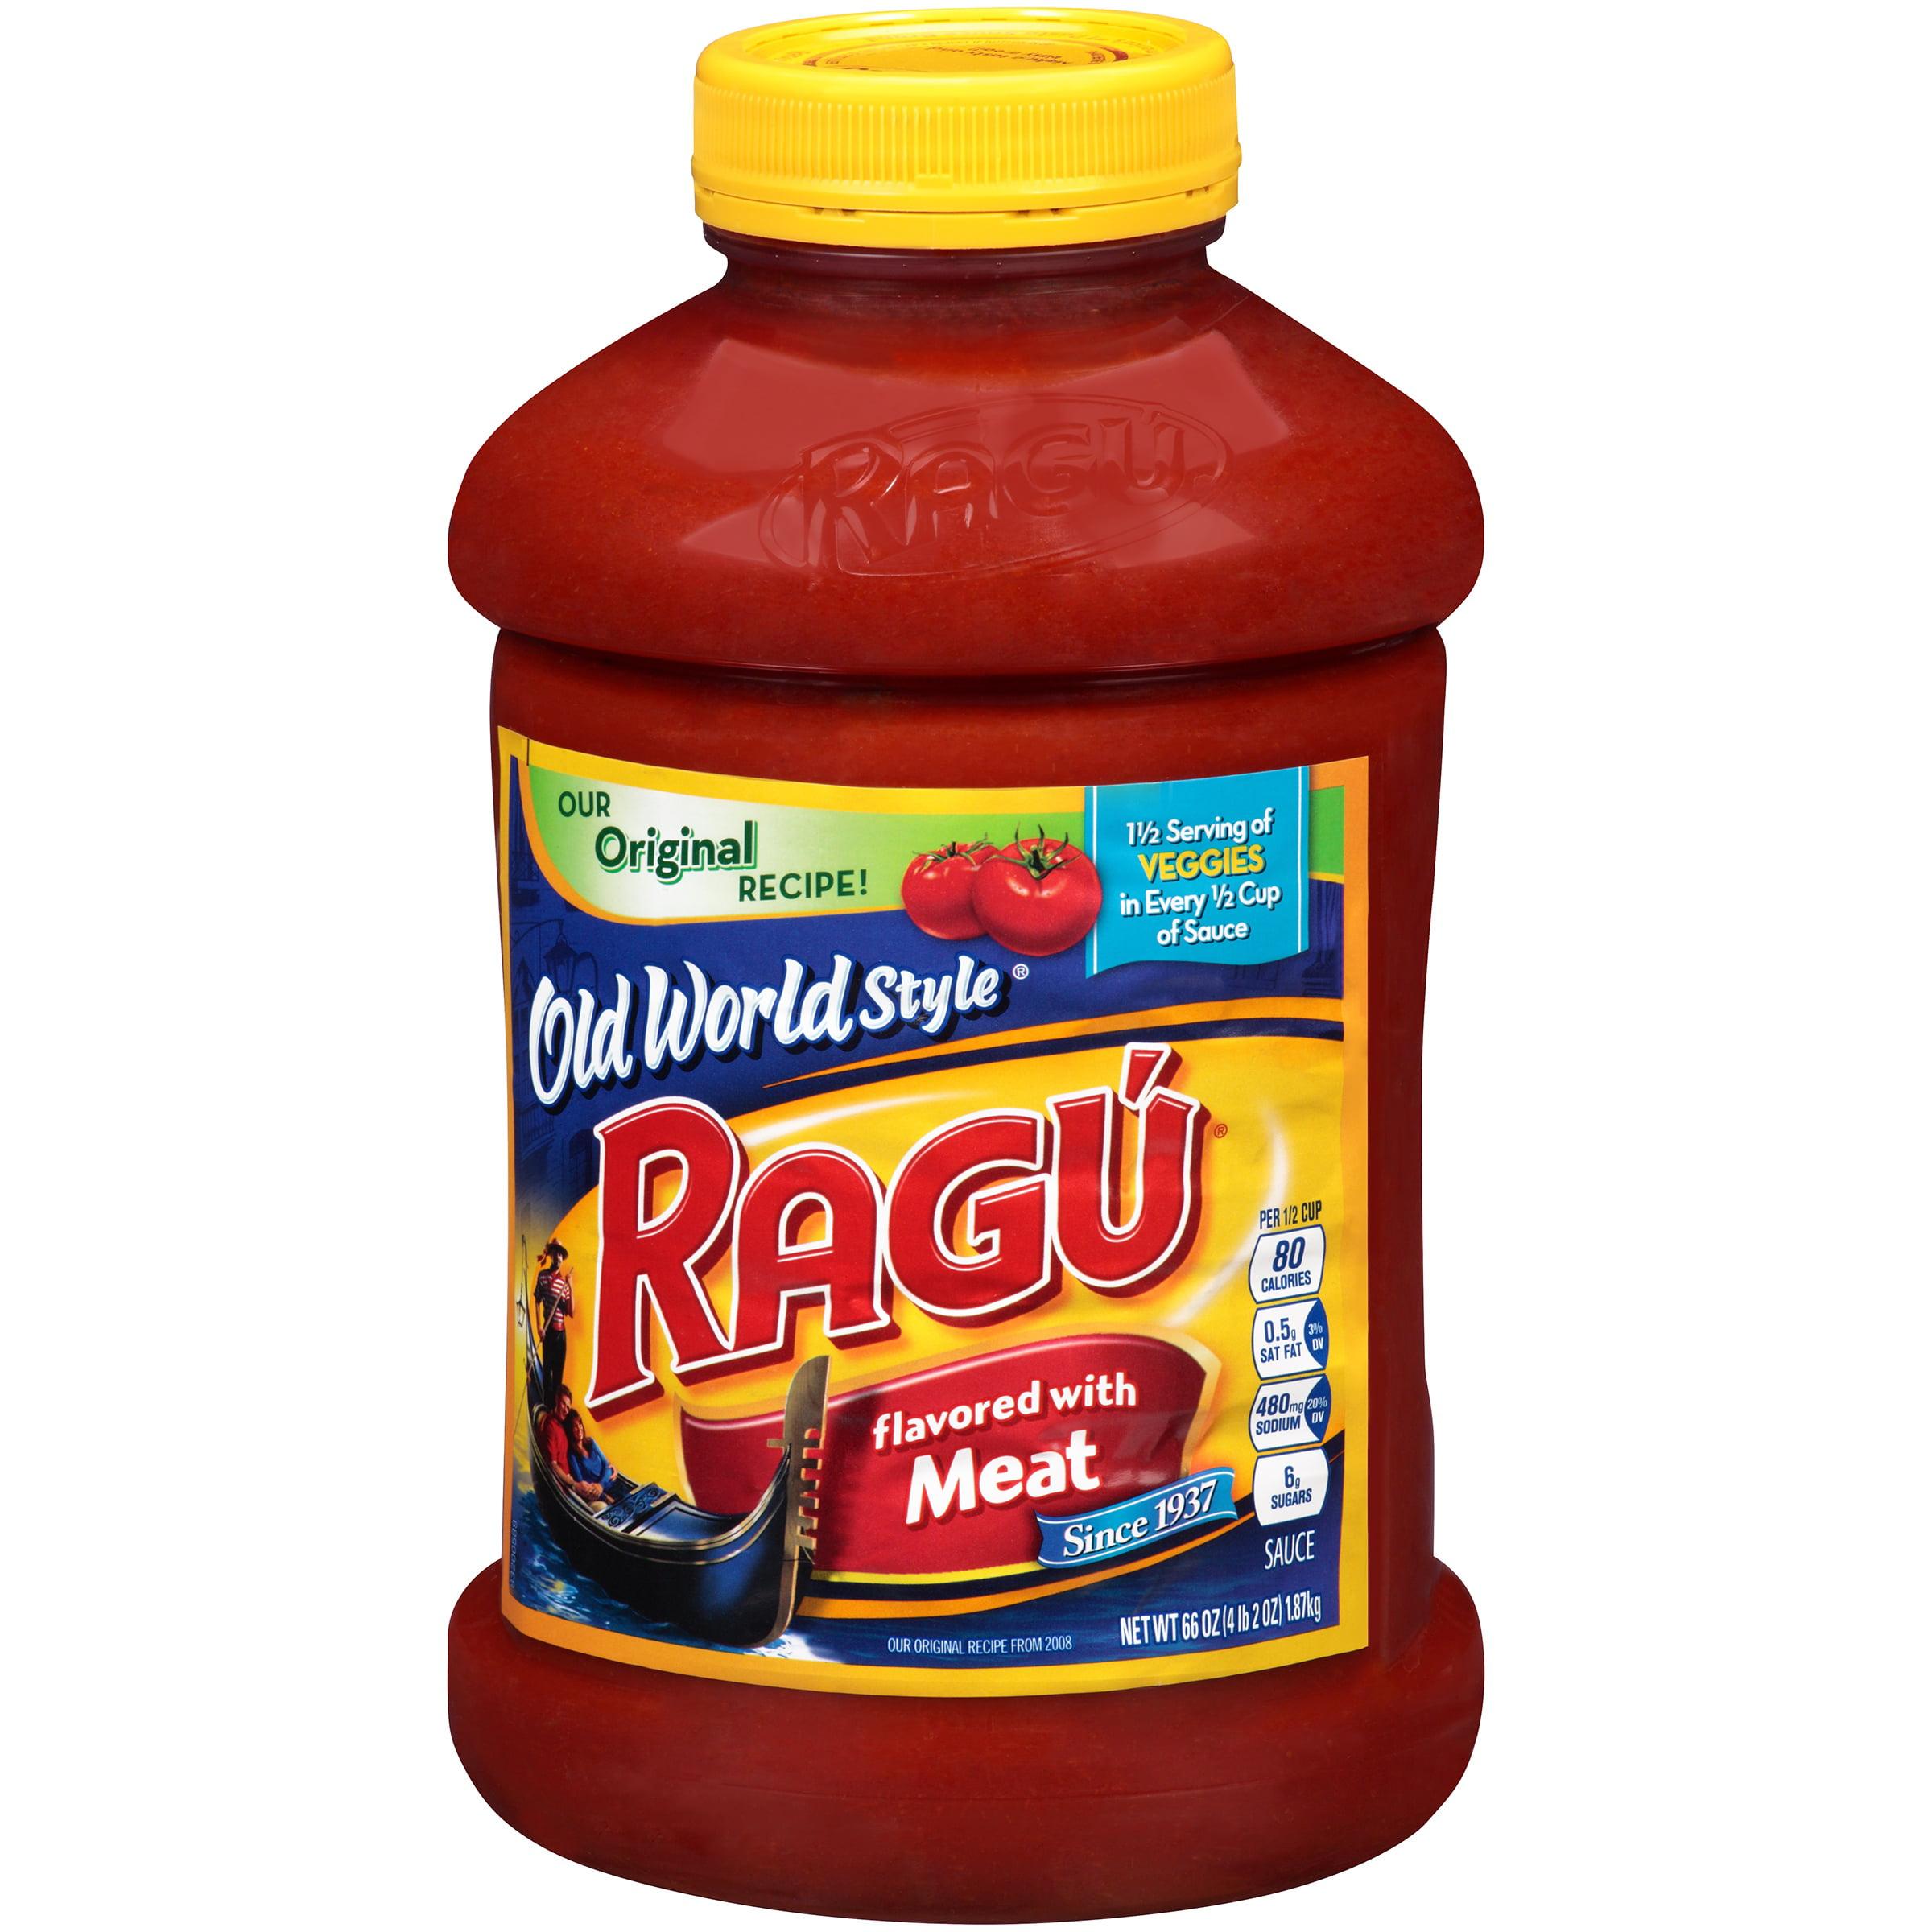 Ragú Old World Style Meat Pasta Sauce 66 oz.